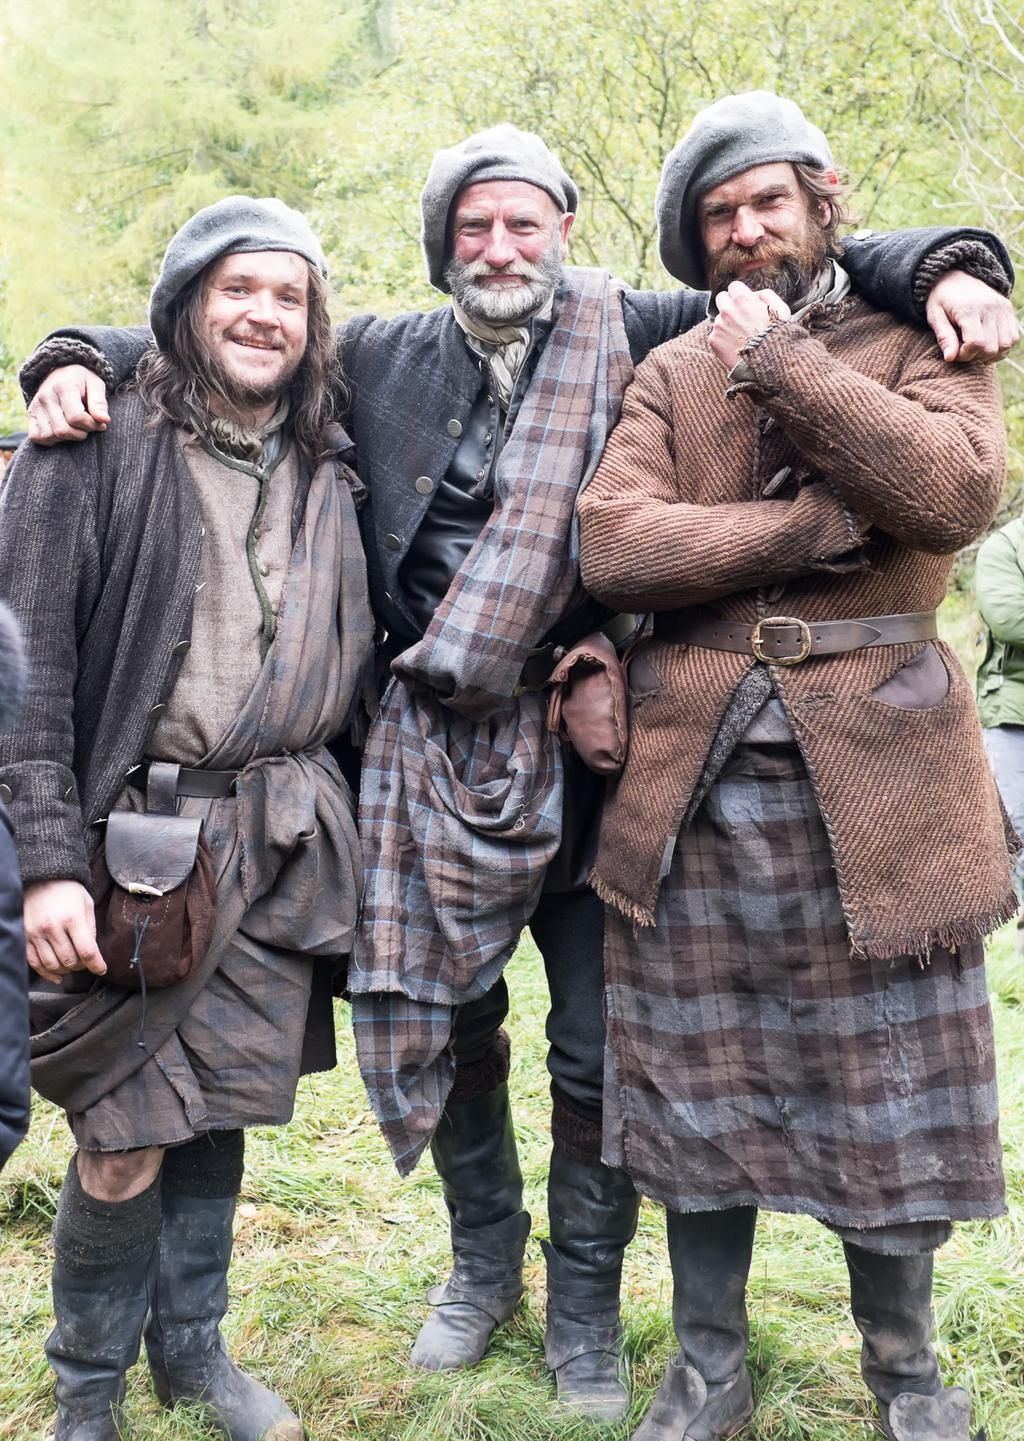 Matthew B Roberts on in 2020 Outlander tv, Outlander